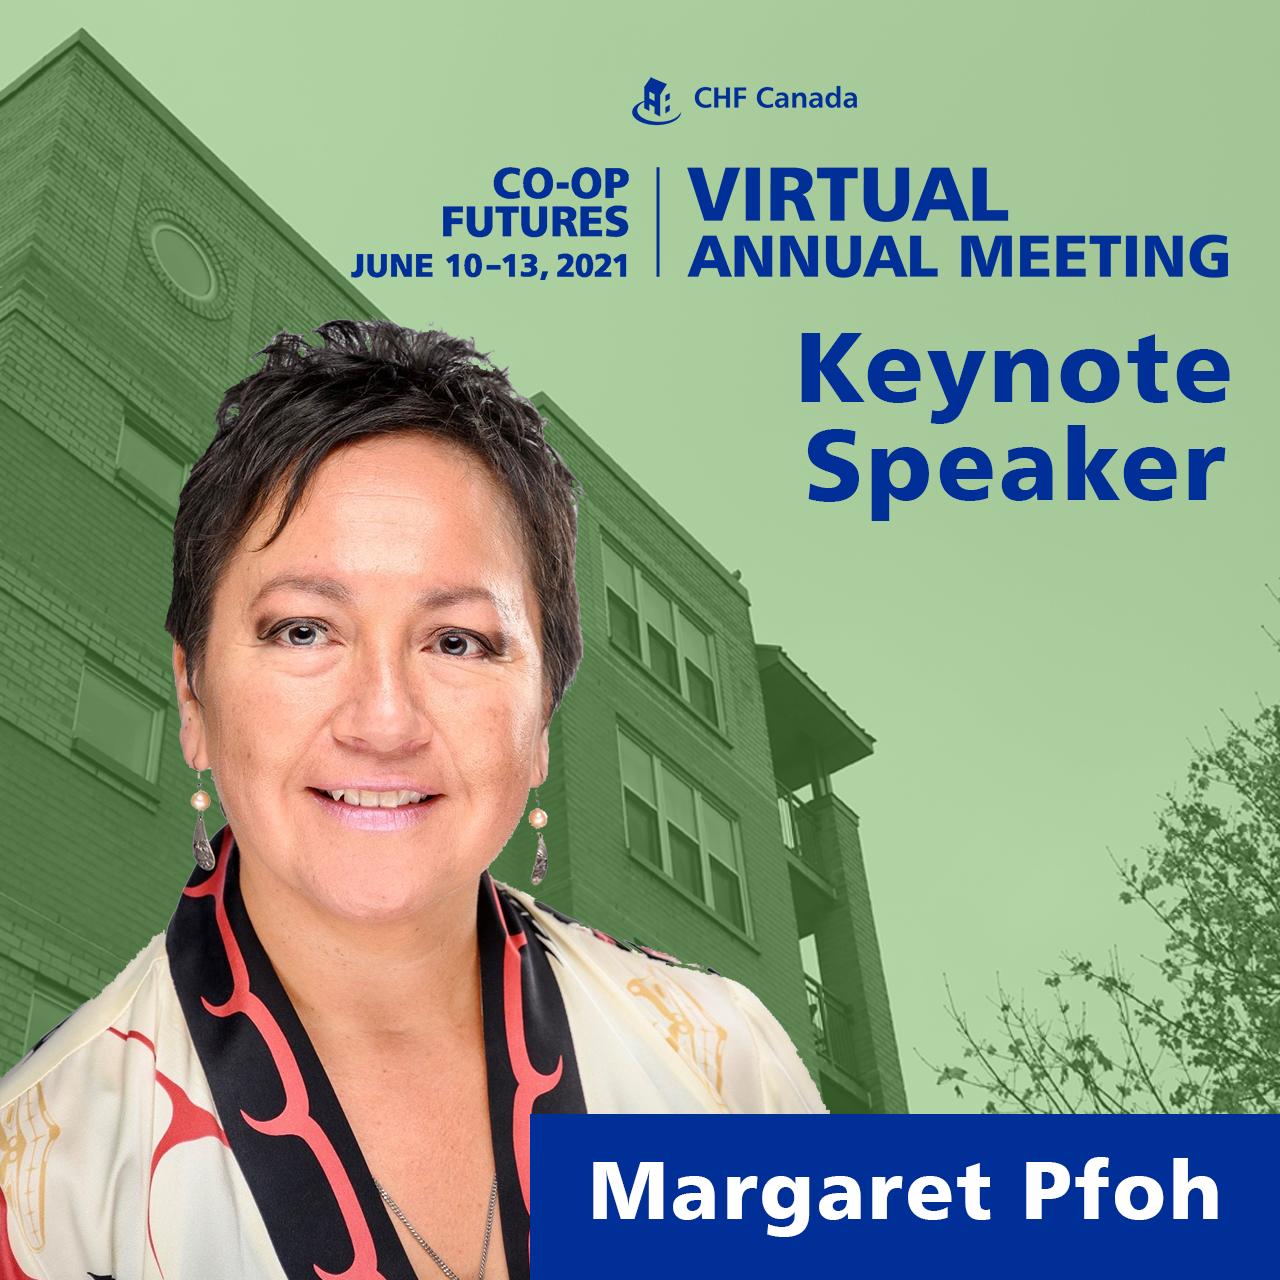 Margaret Pfoh